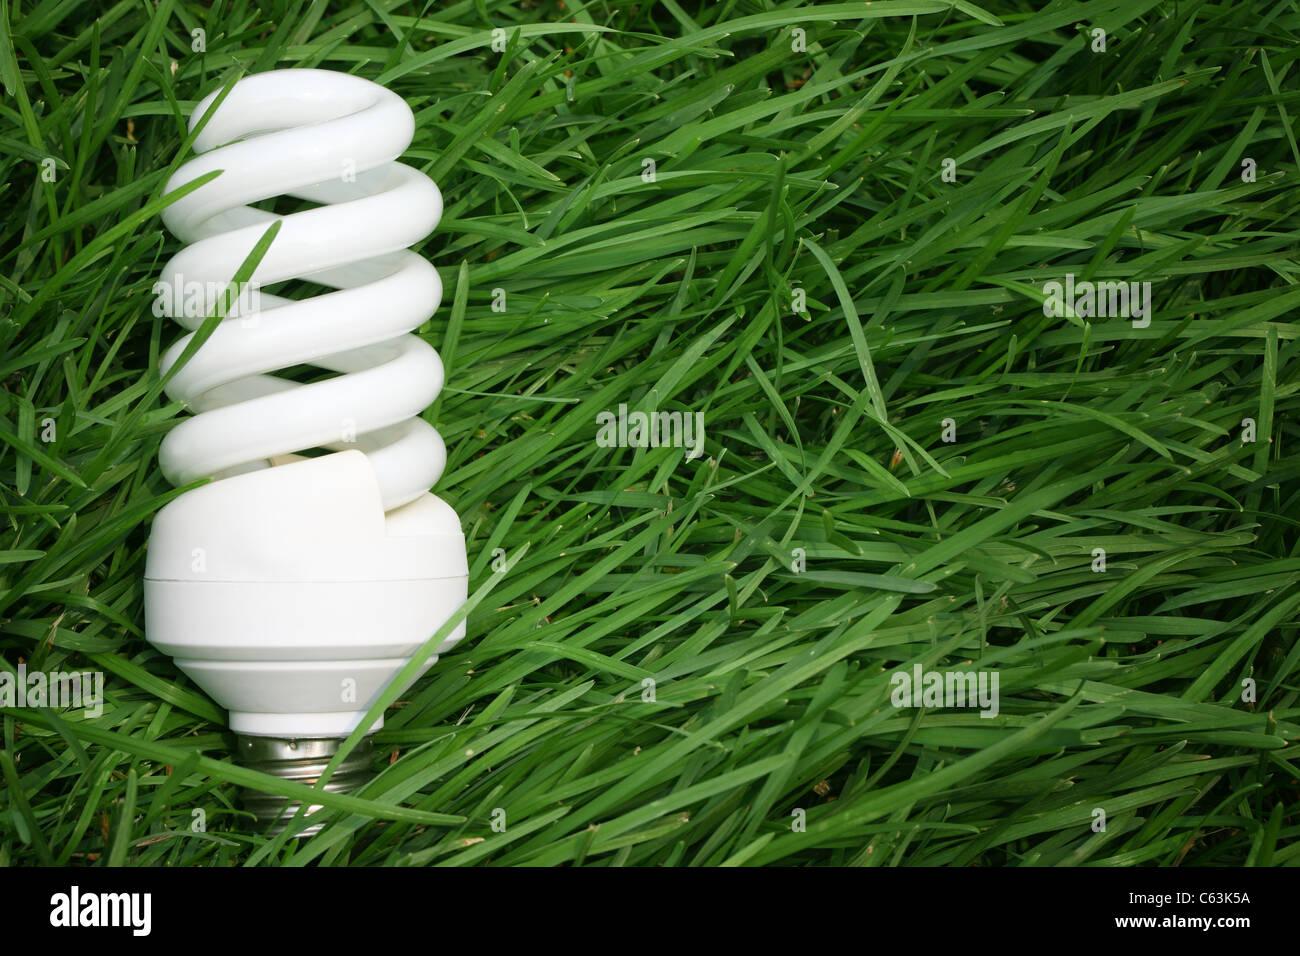 Energiesparlampe auf dem grünen Rasen, Energiesparkonzept. Stockbild